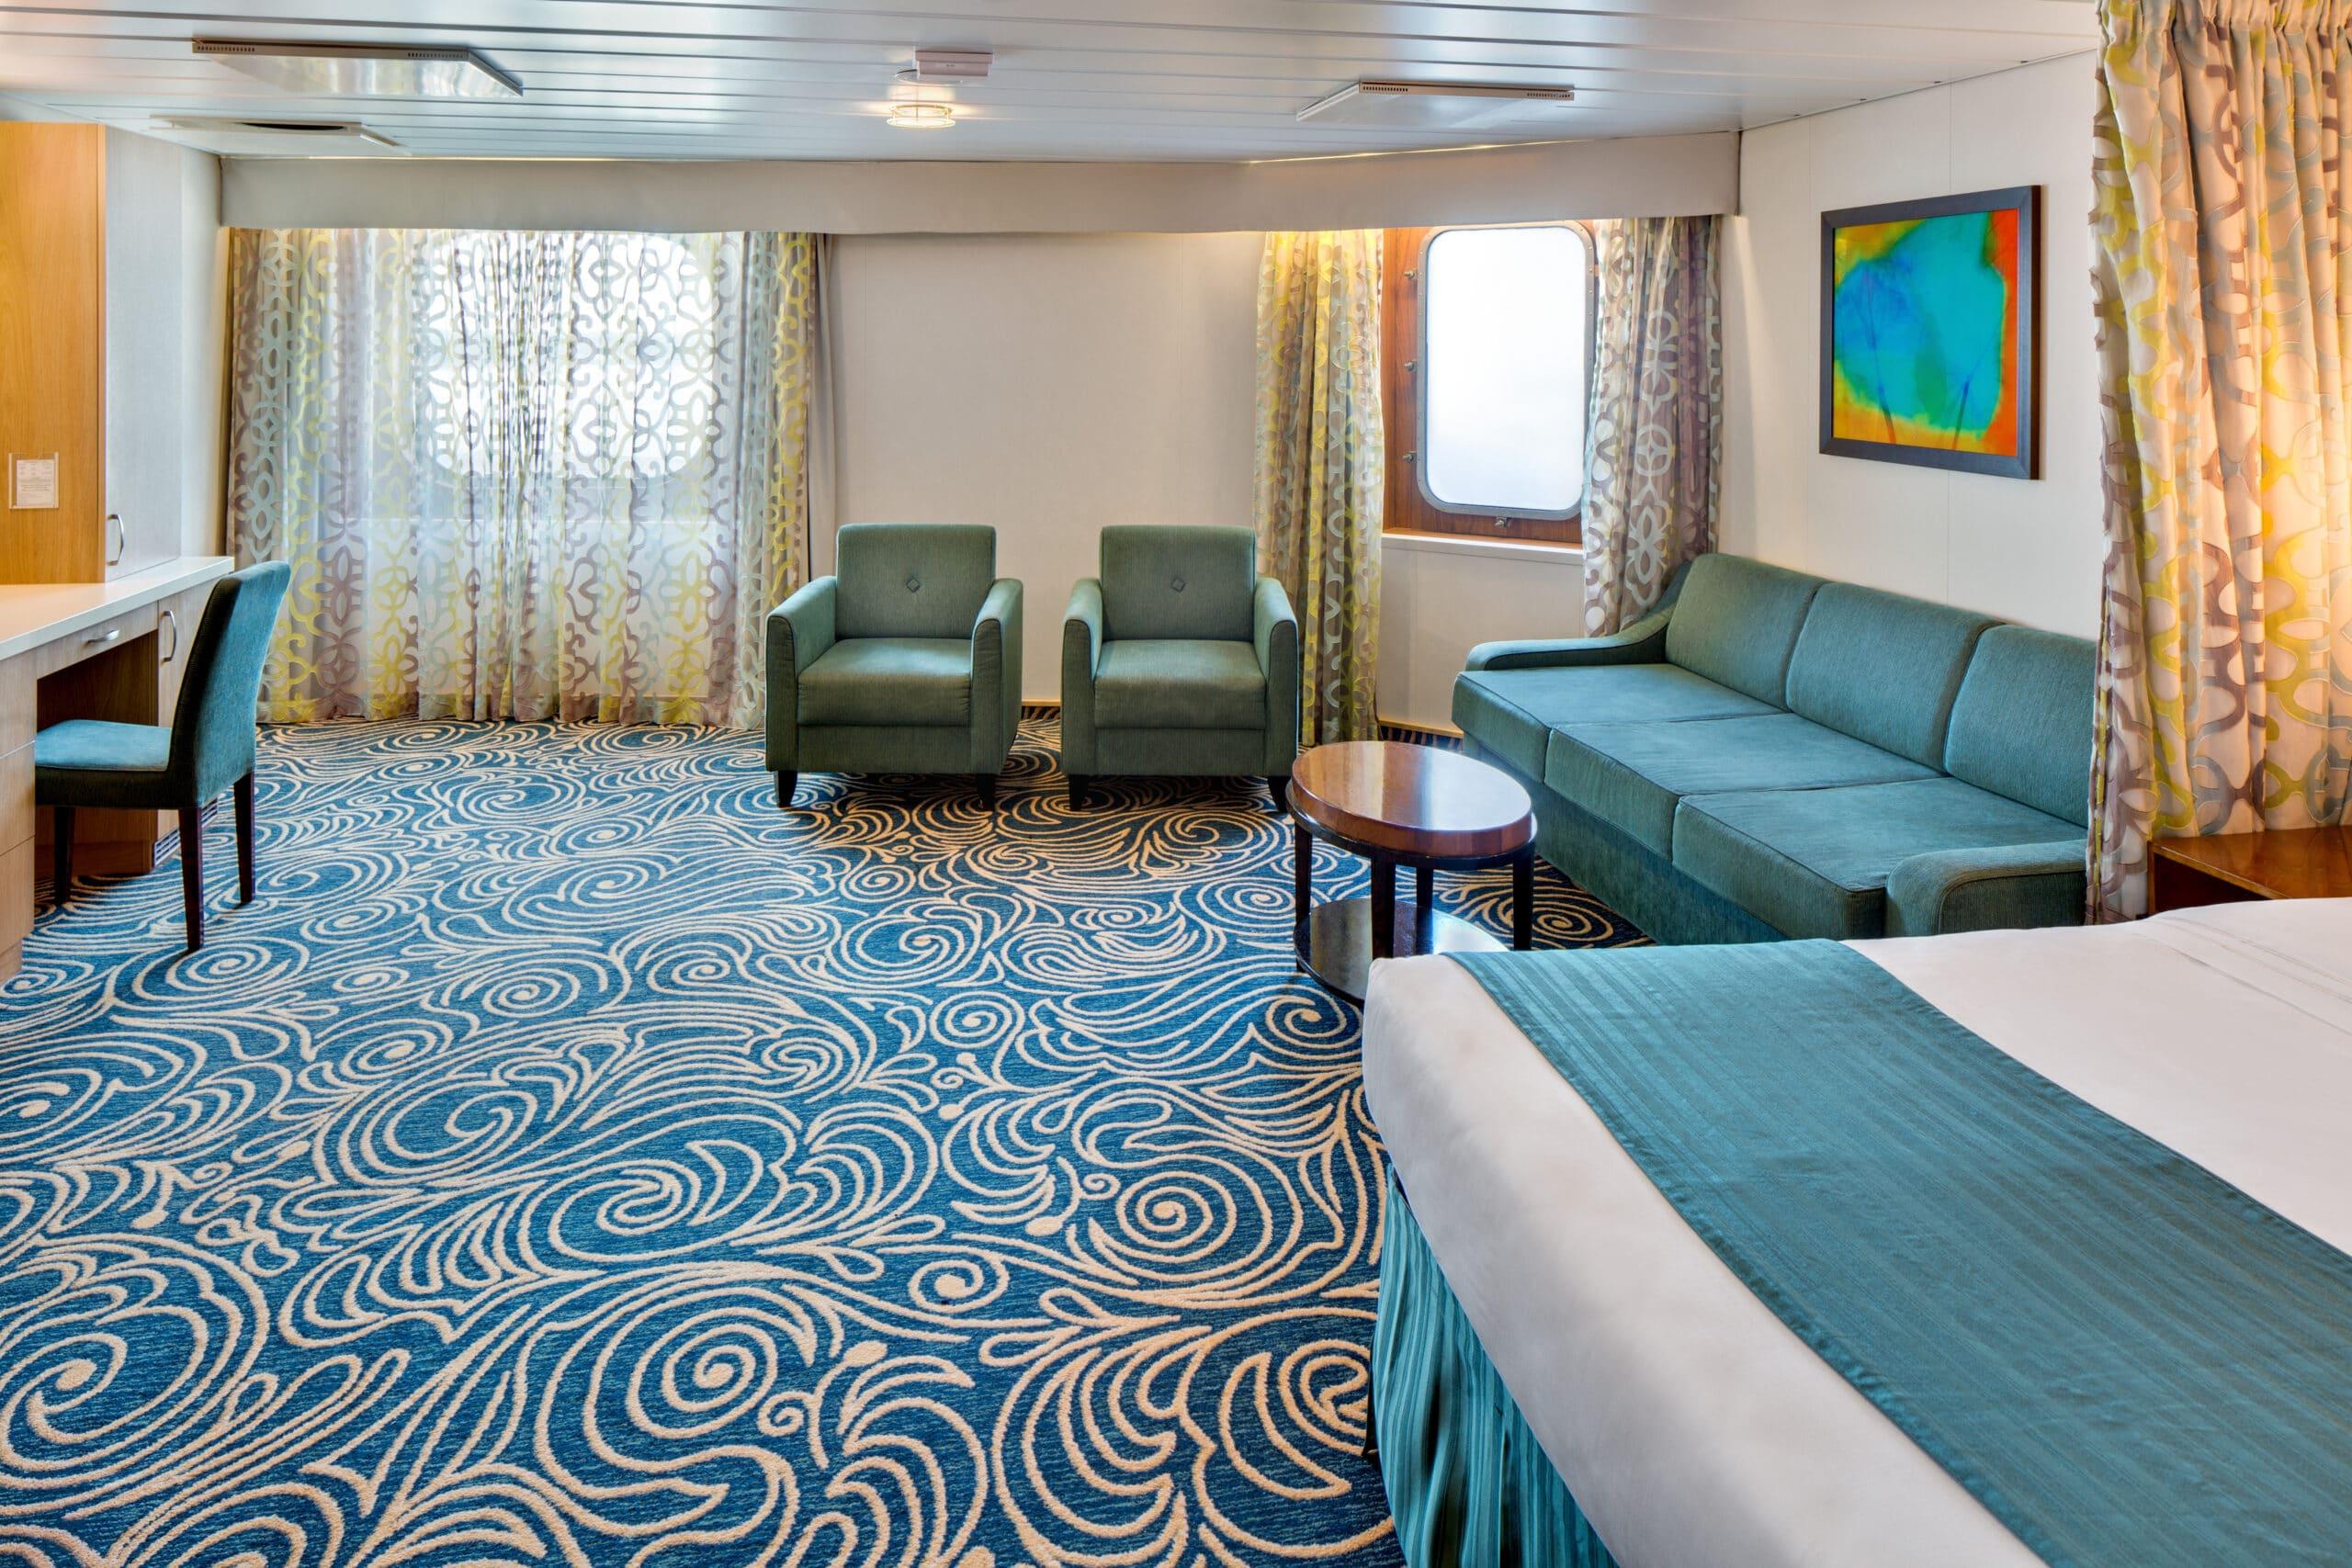 Royal-Caribbean-International-Vision-of-the-Seas-schip-cruiseschip-categorie-VO-Ocean-Suite